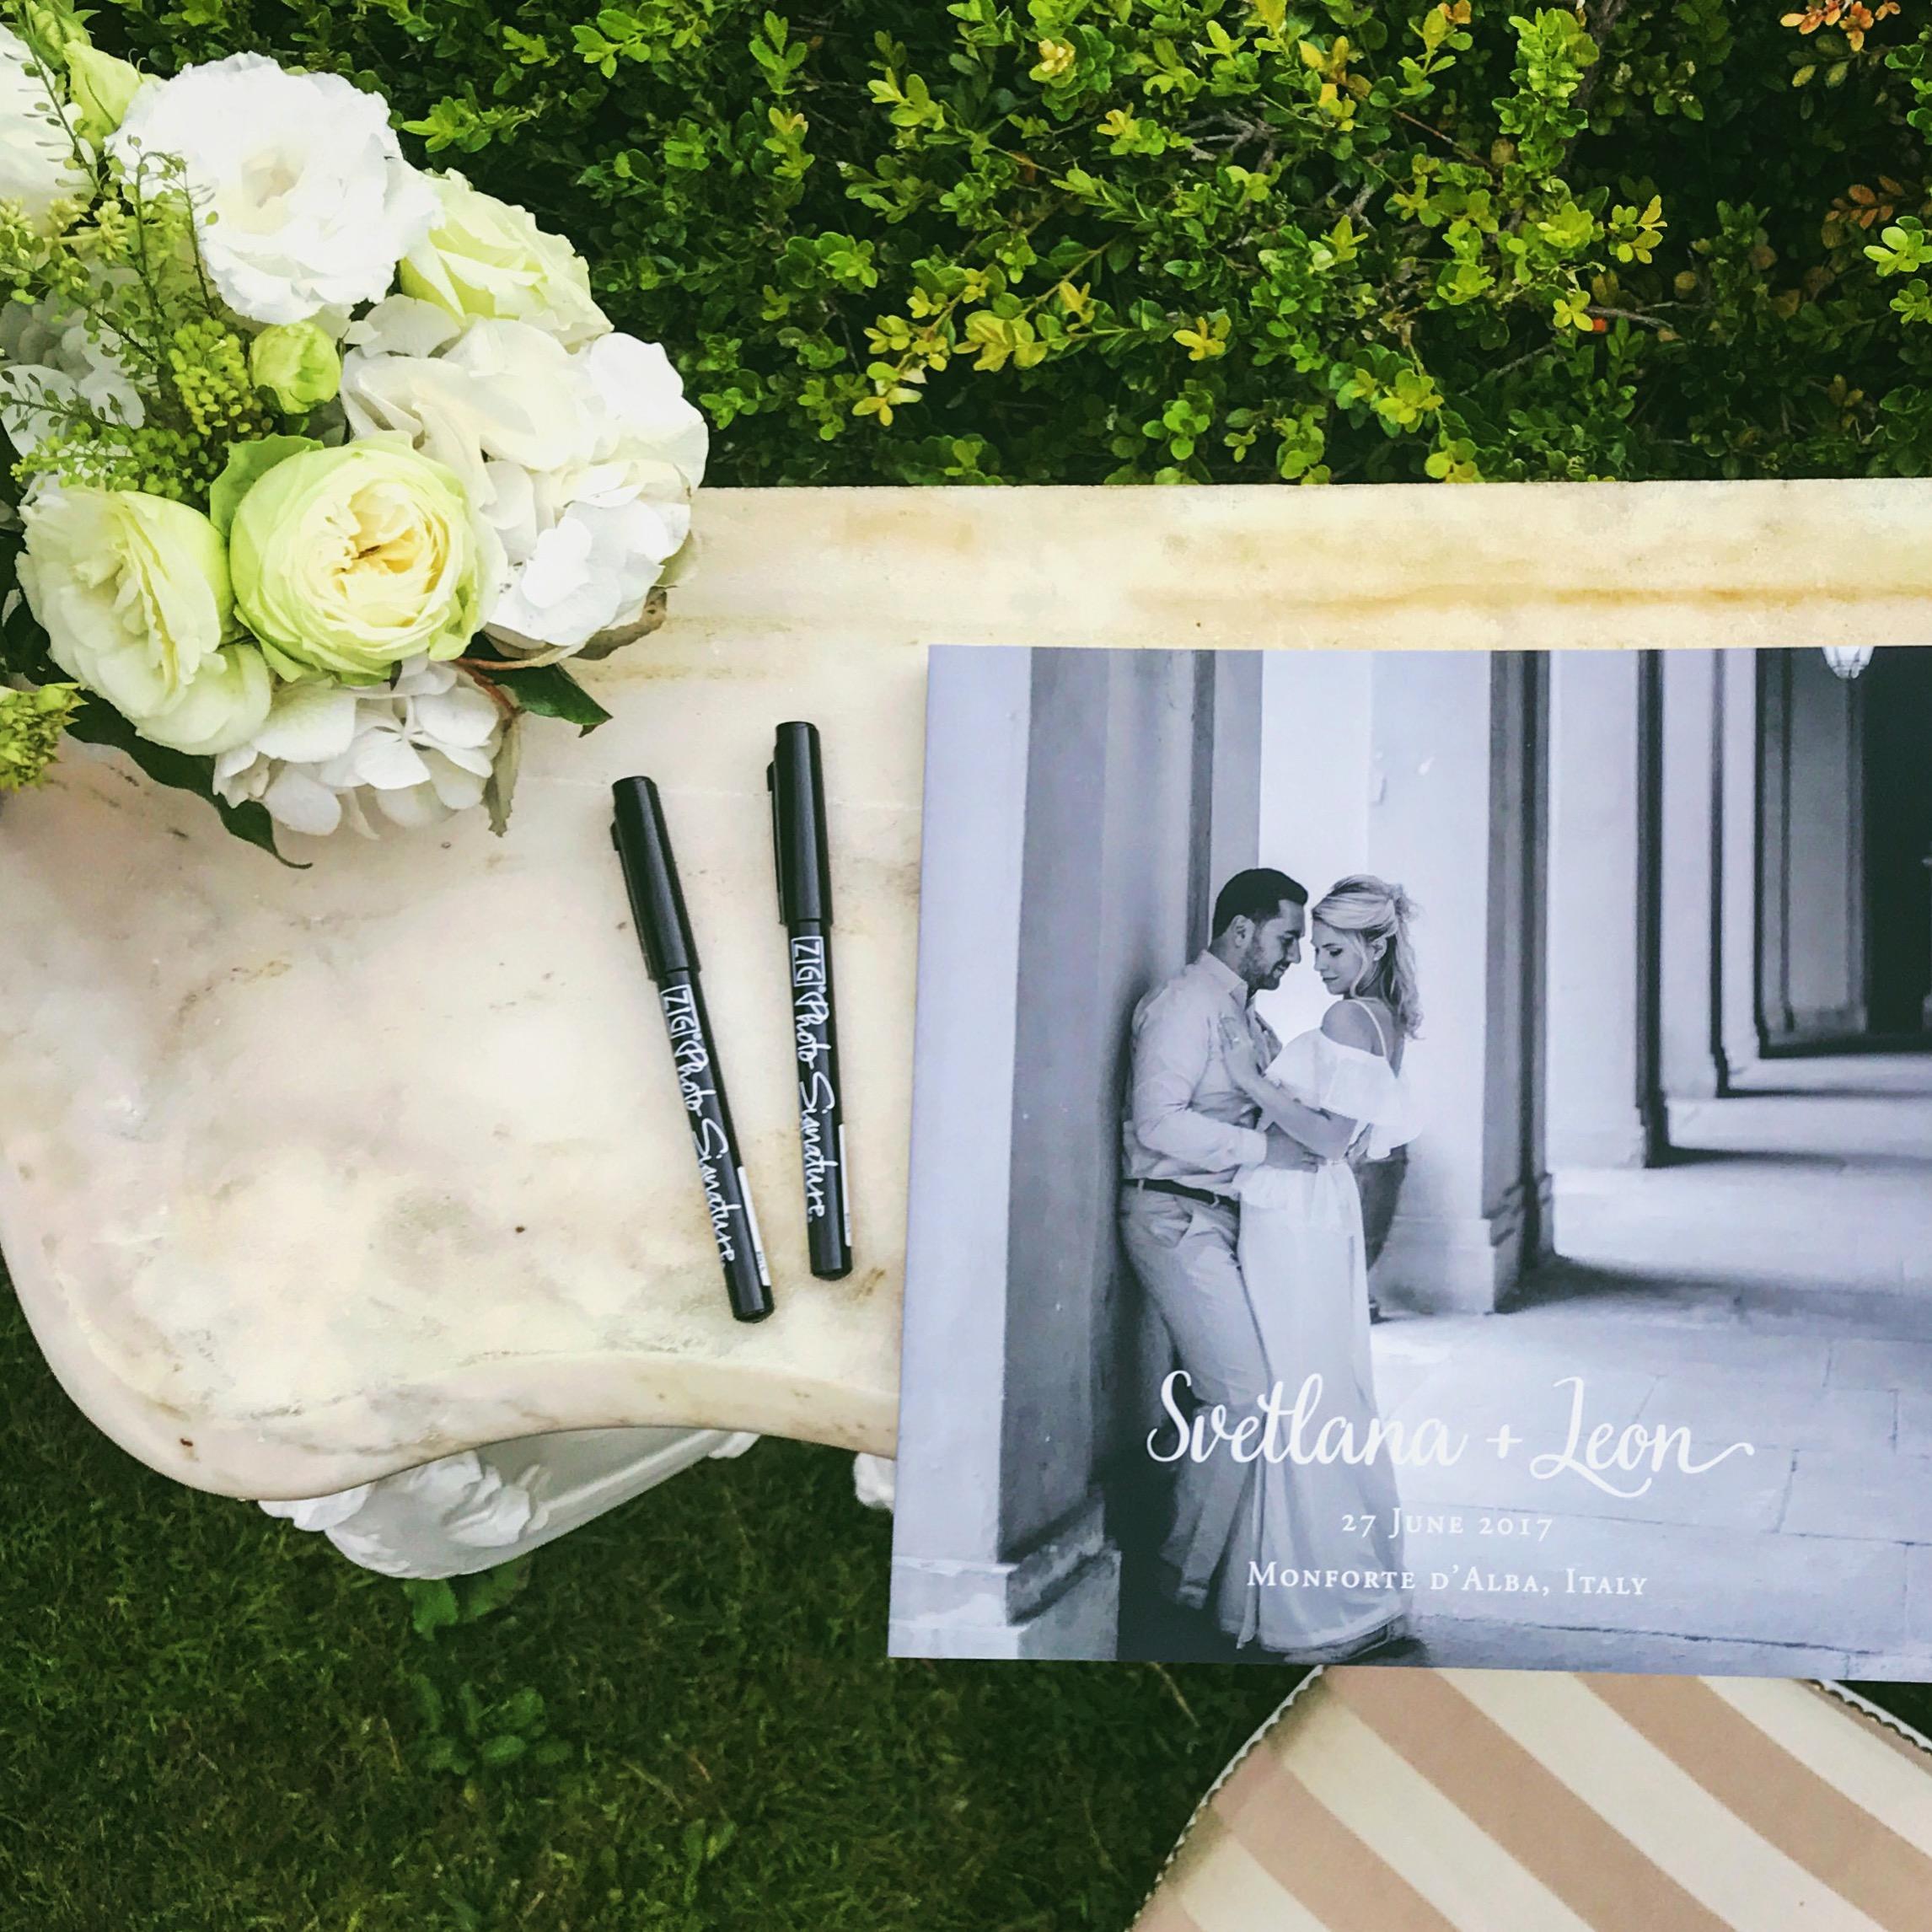 alex-edge-destination-wedding-italy-1.JPG